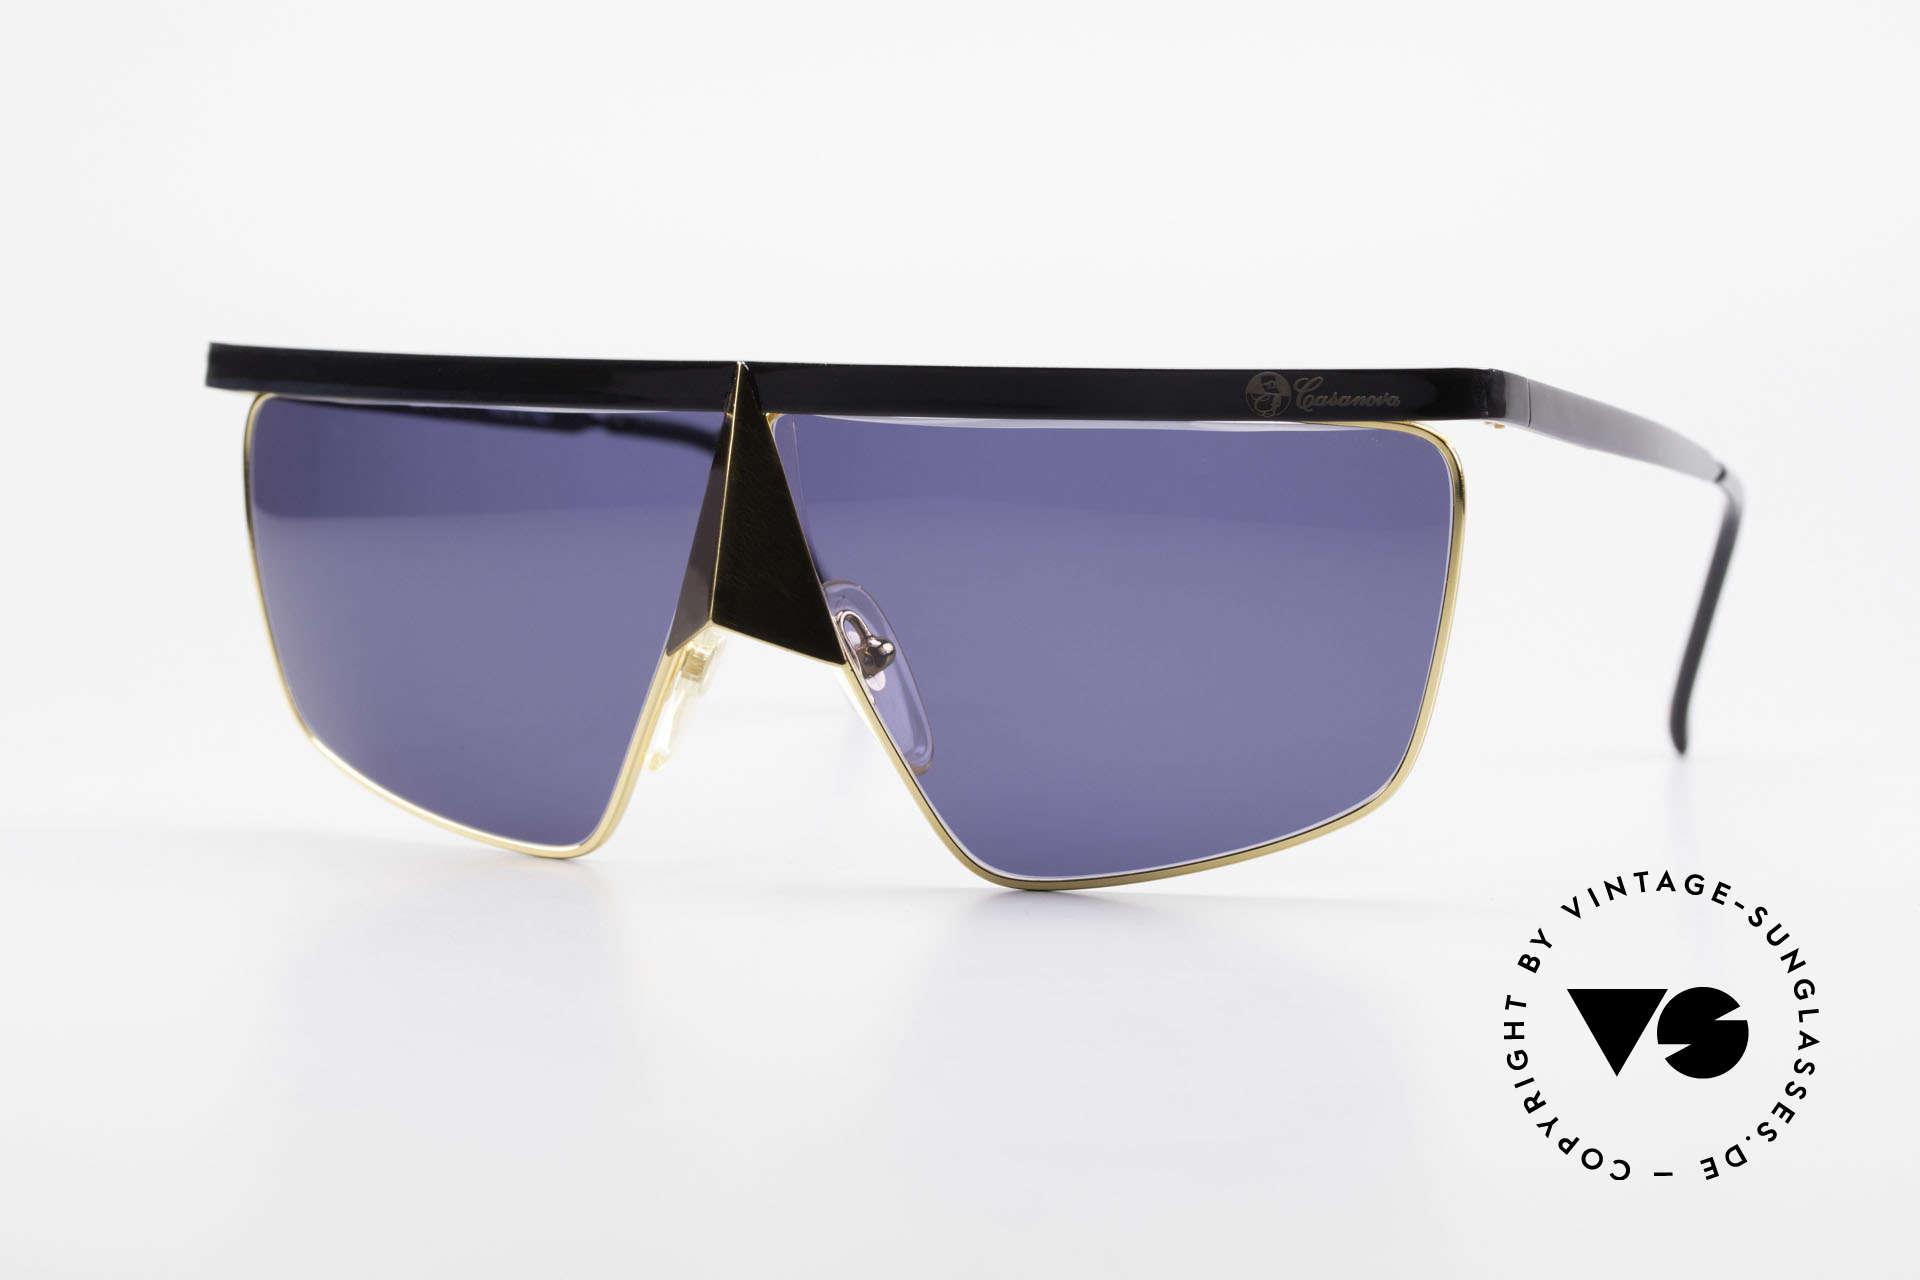 Casanova FC10 24kt Noseguard Sunglasses, interesting Casanova 'nose sunglasses' from app. 1985, Made for Men and Women